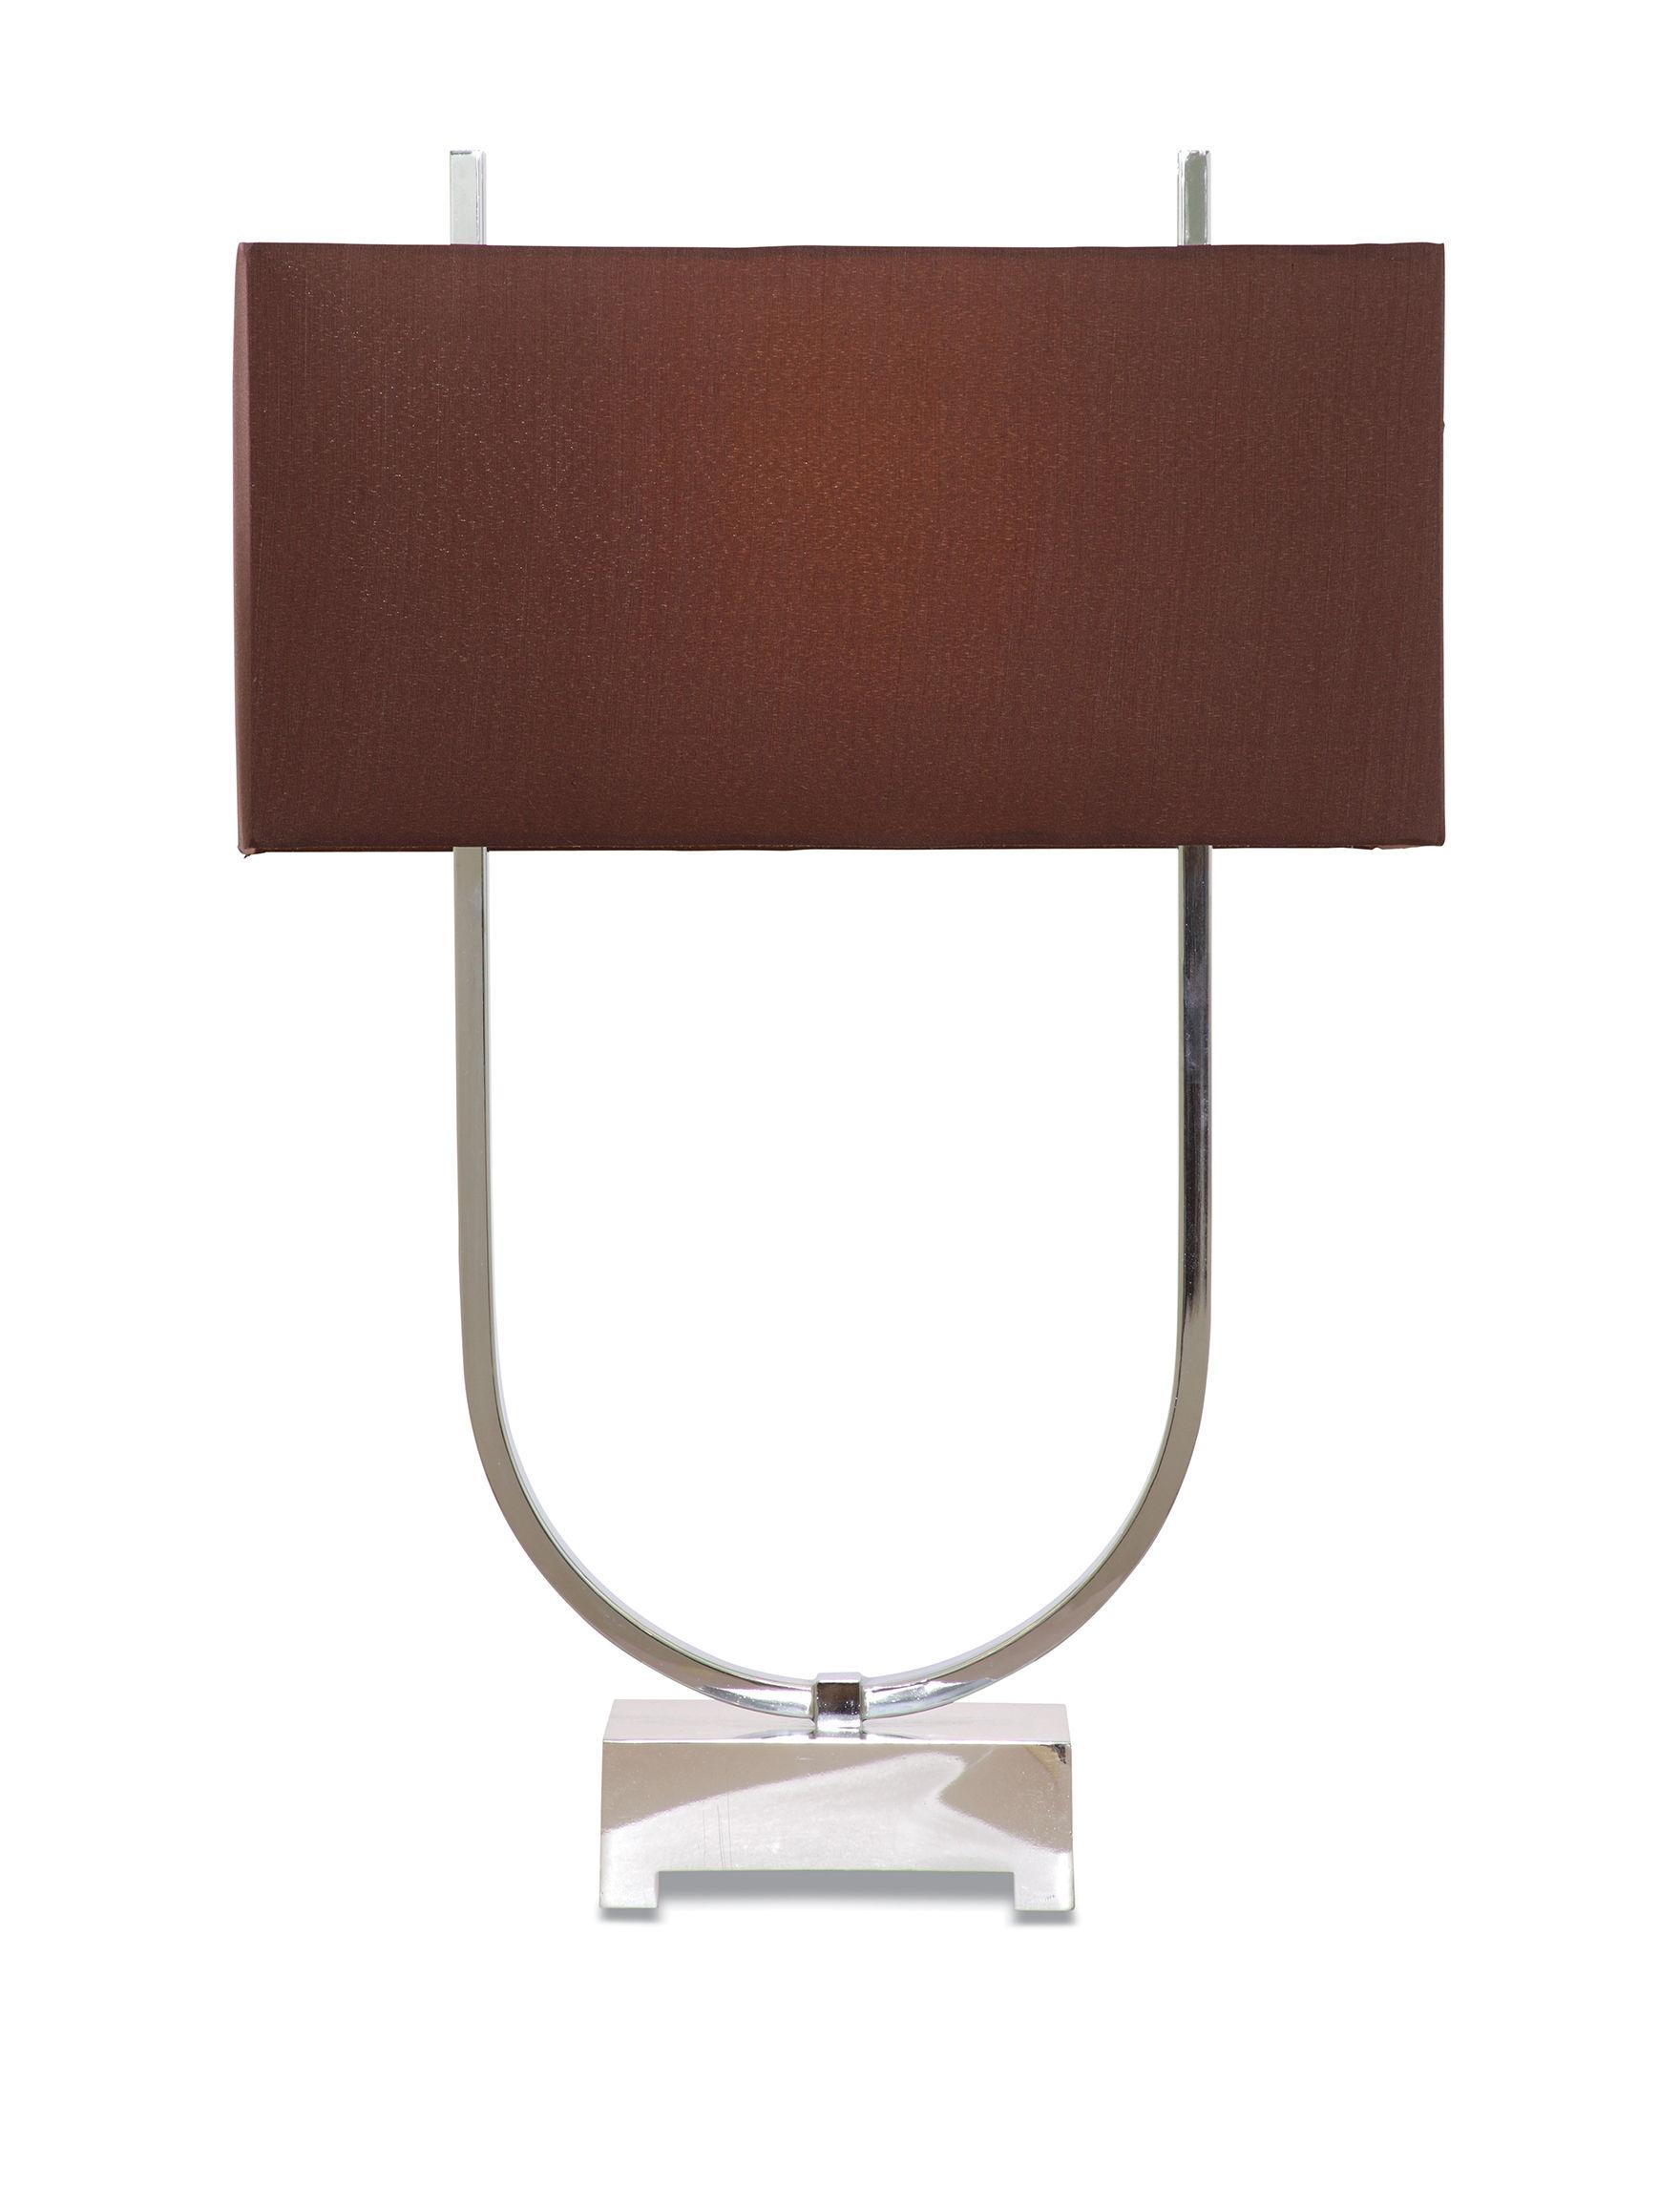 Bassett Mirror Co. Chrome plated Table Lamps Lighting & Lamps